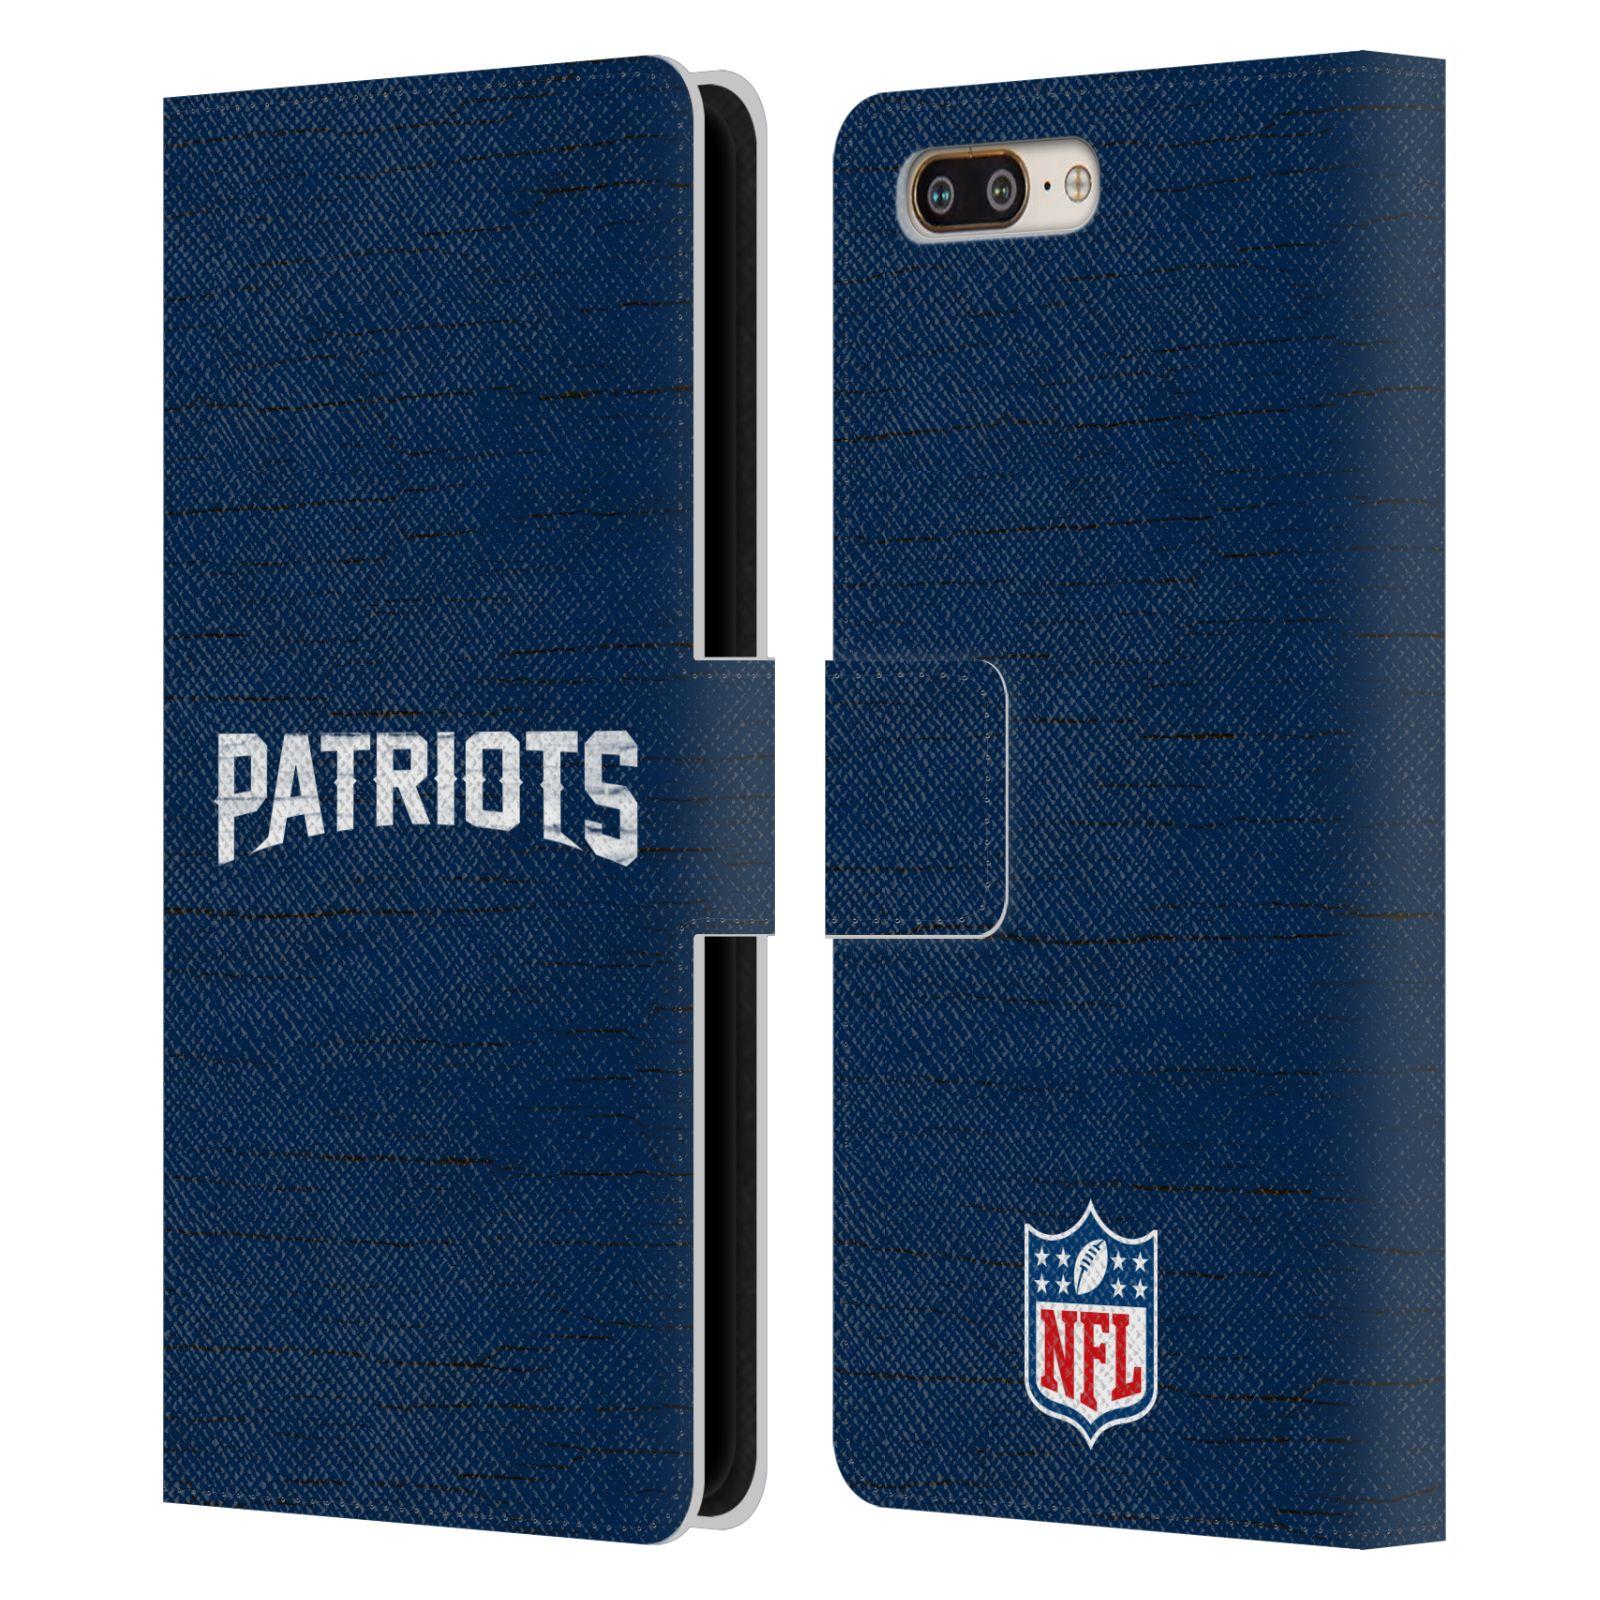 NFL-NEW-ENGLAND-PATRIOTS-LOGO-COVER-PORTAFOGLIO-IN-PELLE-PER-BLACKBERRY-ONEPLUS